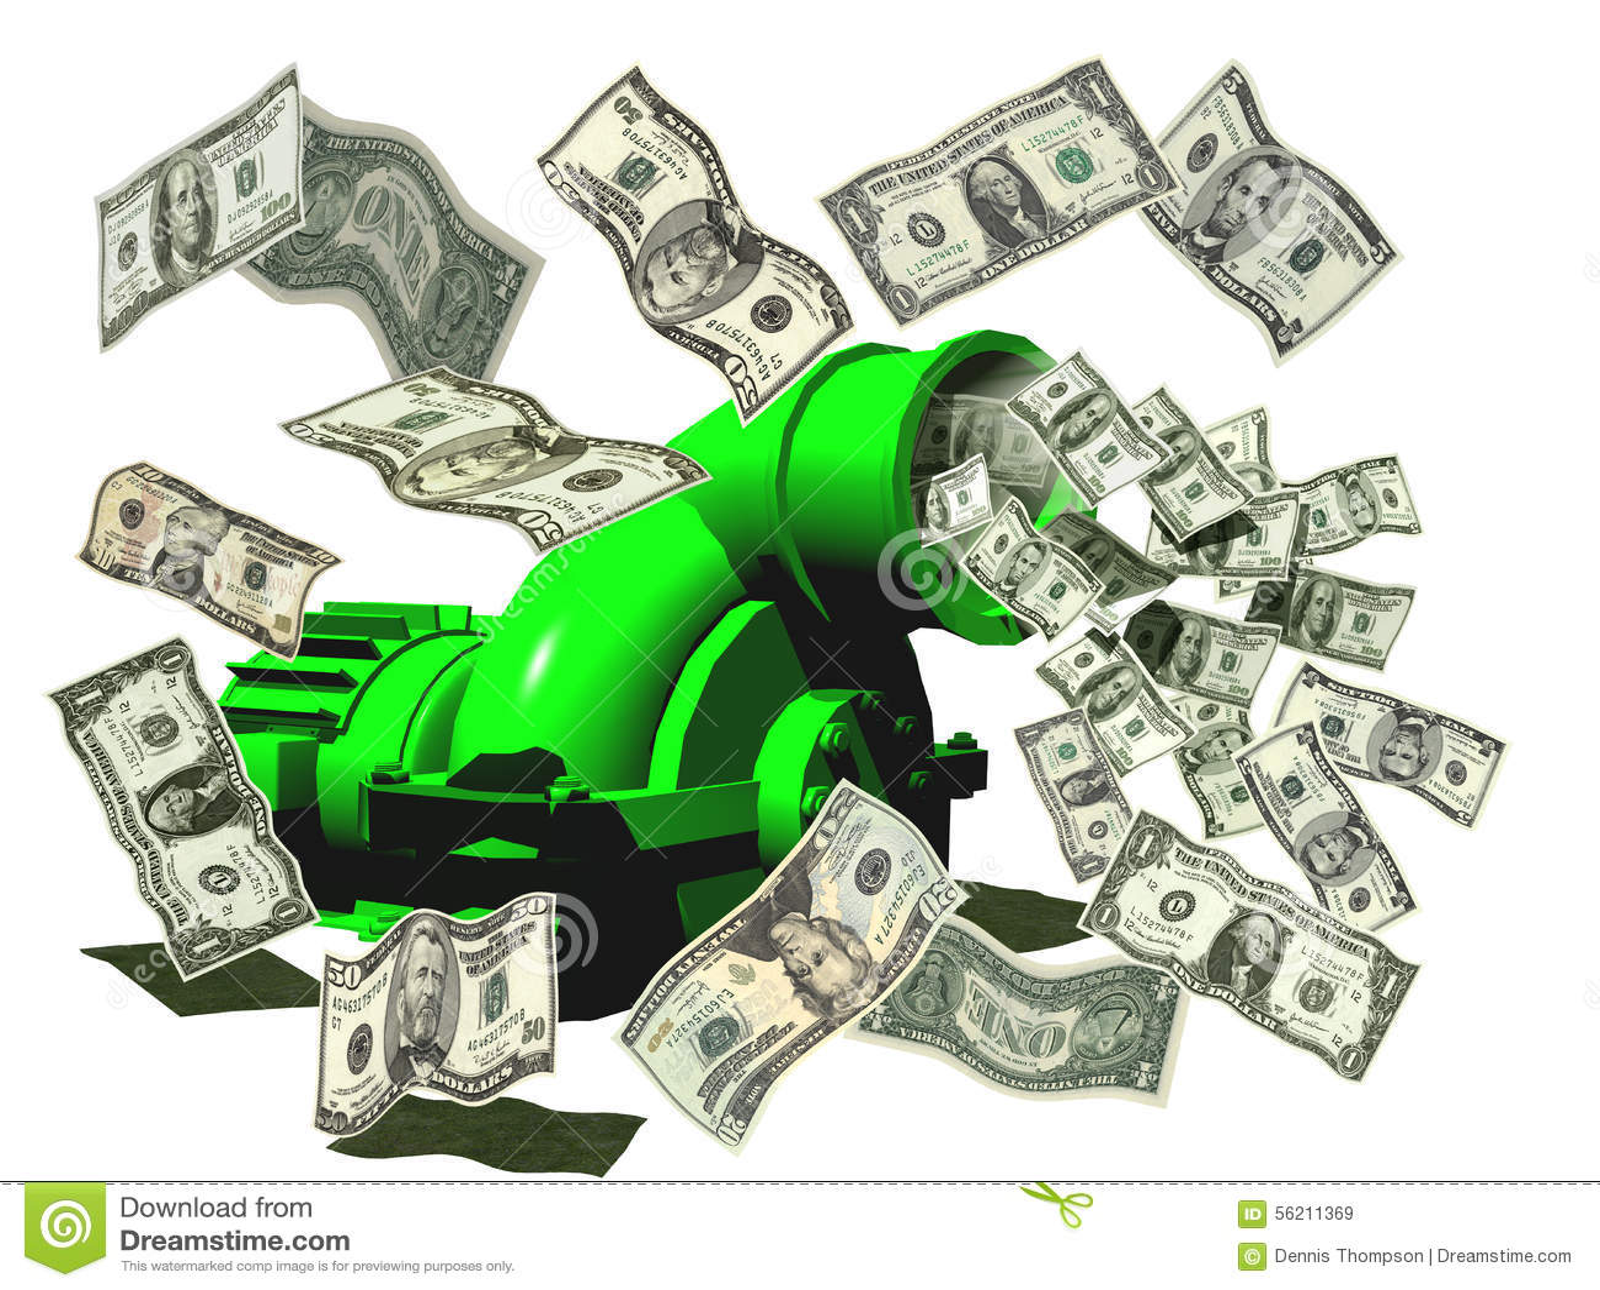 Easy money making online free xbox